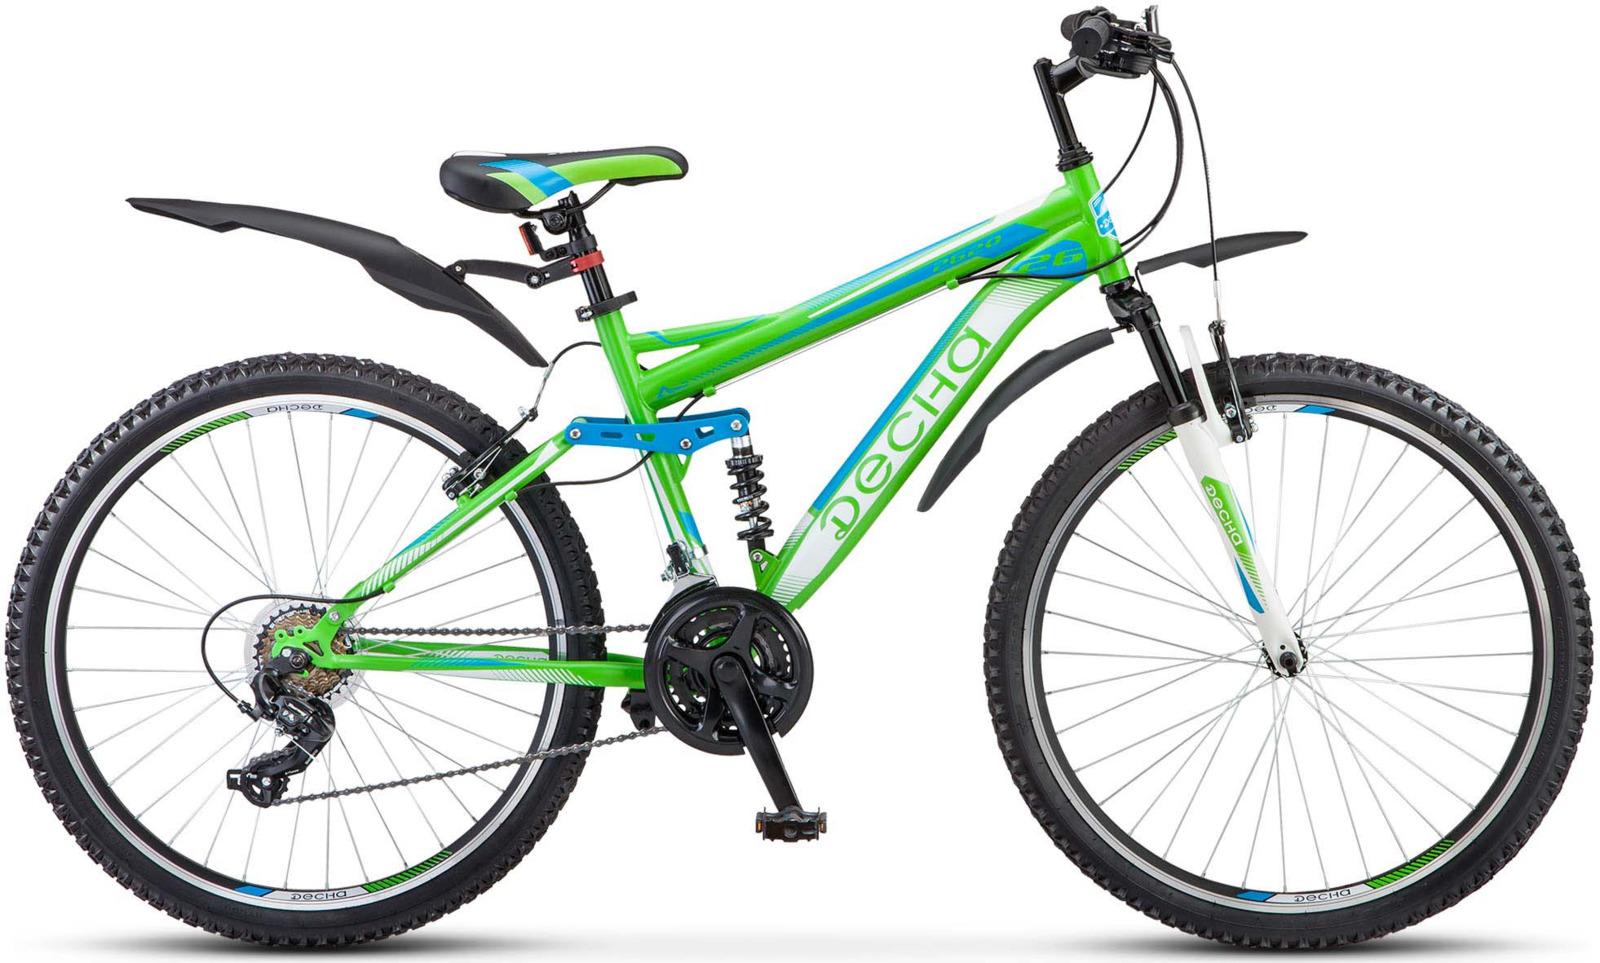 Велосипед Stels Десна-2620 V 16,5, LU071344, светло-зеленый